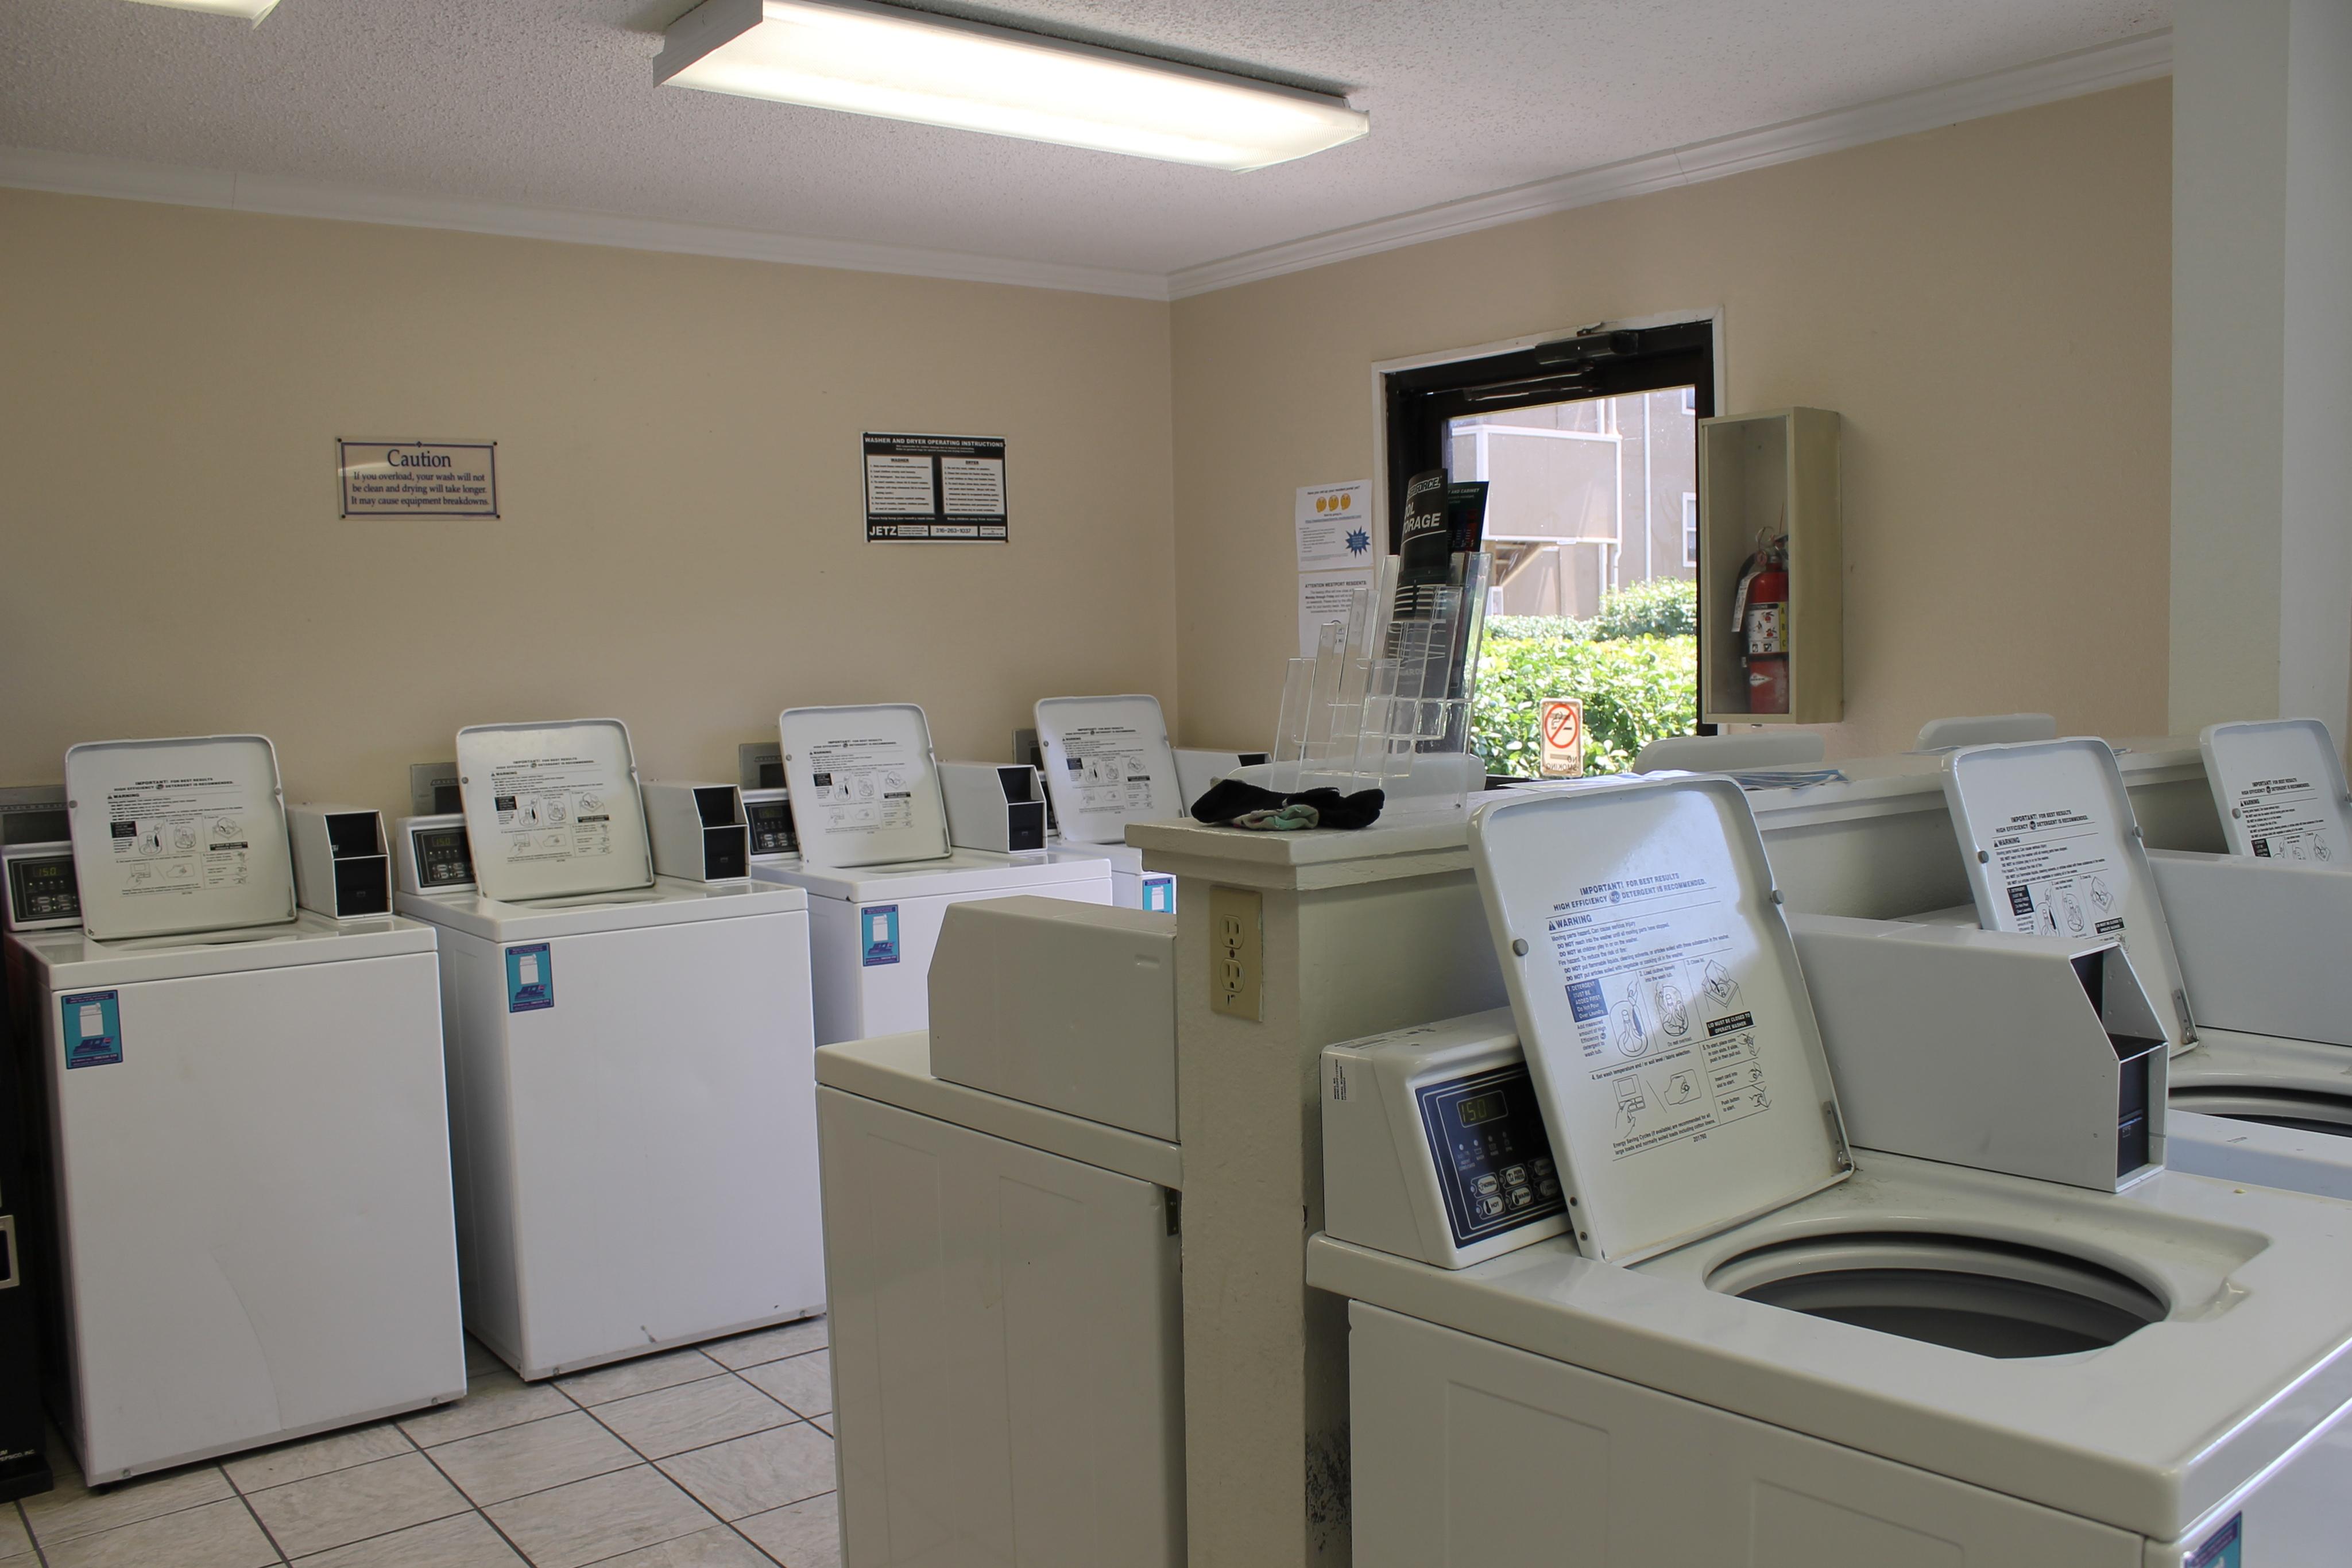 Westport Apartments_Laundry Room_Apartment Complex